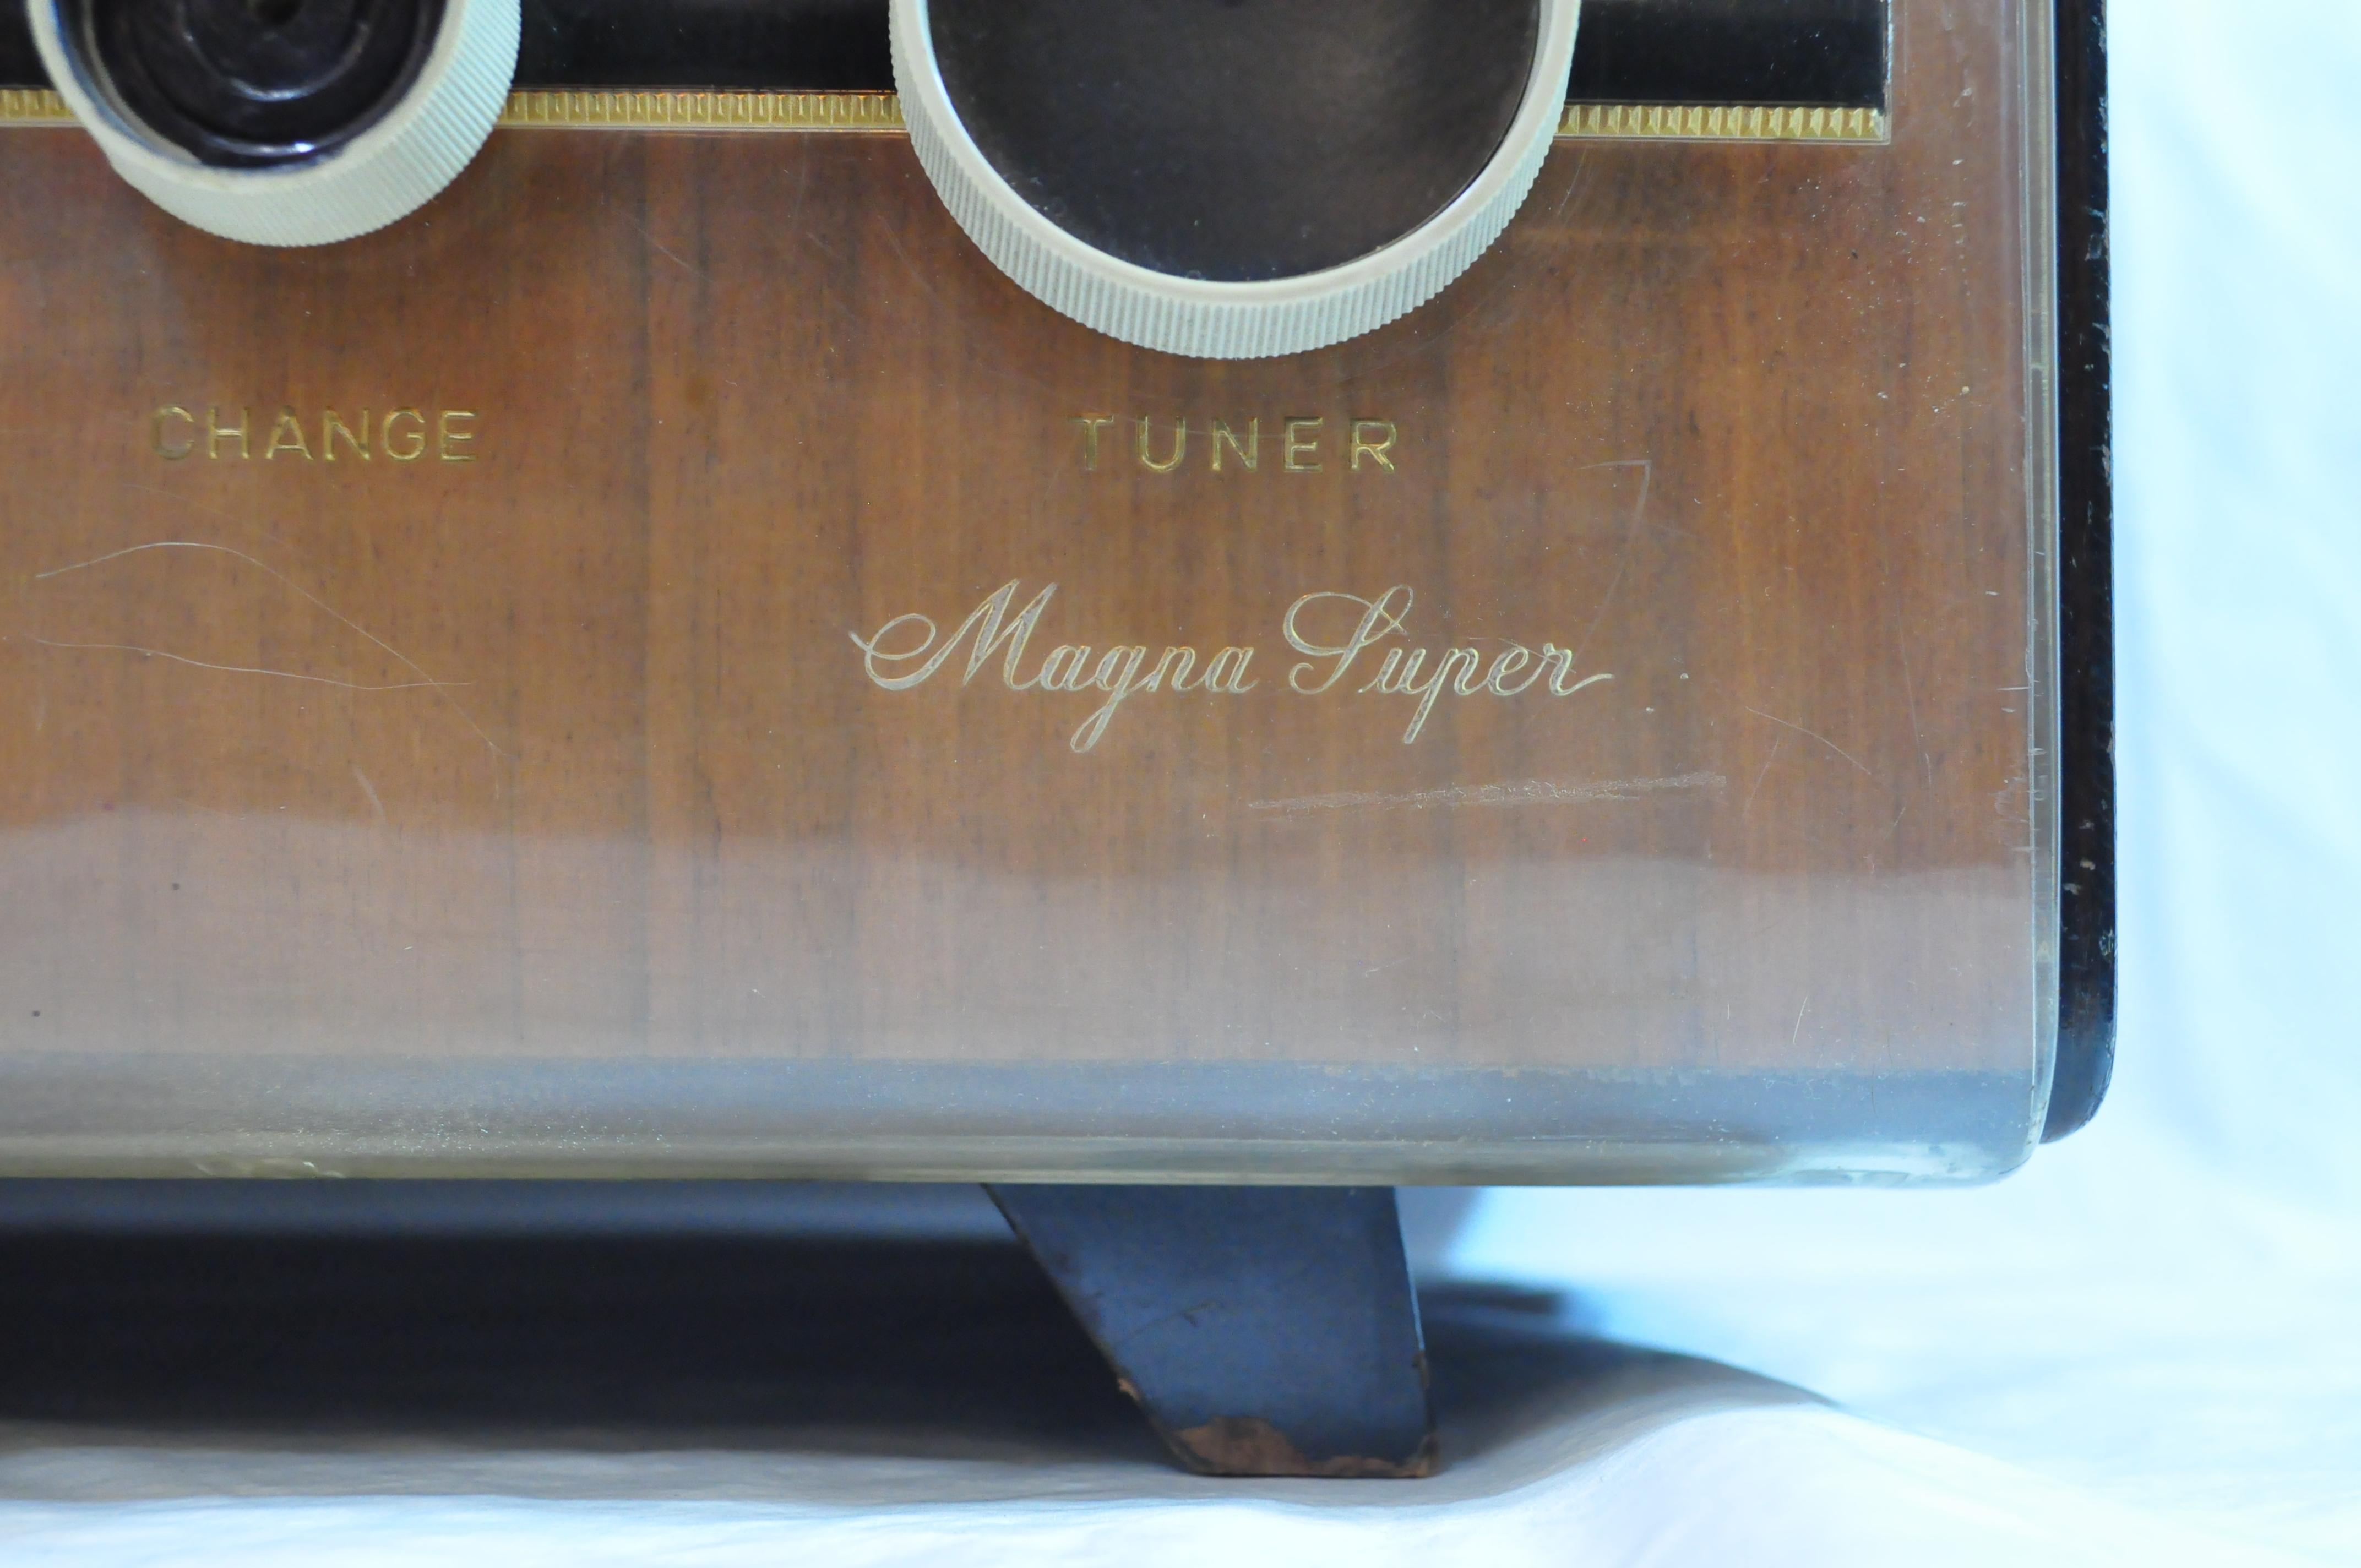 NATIONAL HI-FI RADIO CF-740 MAGNA SUPER / ナショナル ハイファイ レトロ 真空管 ラジオ